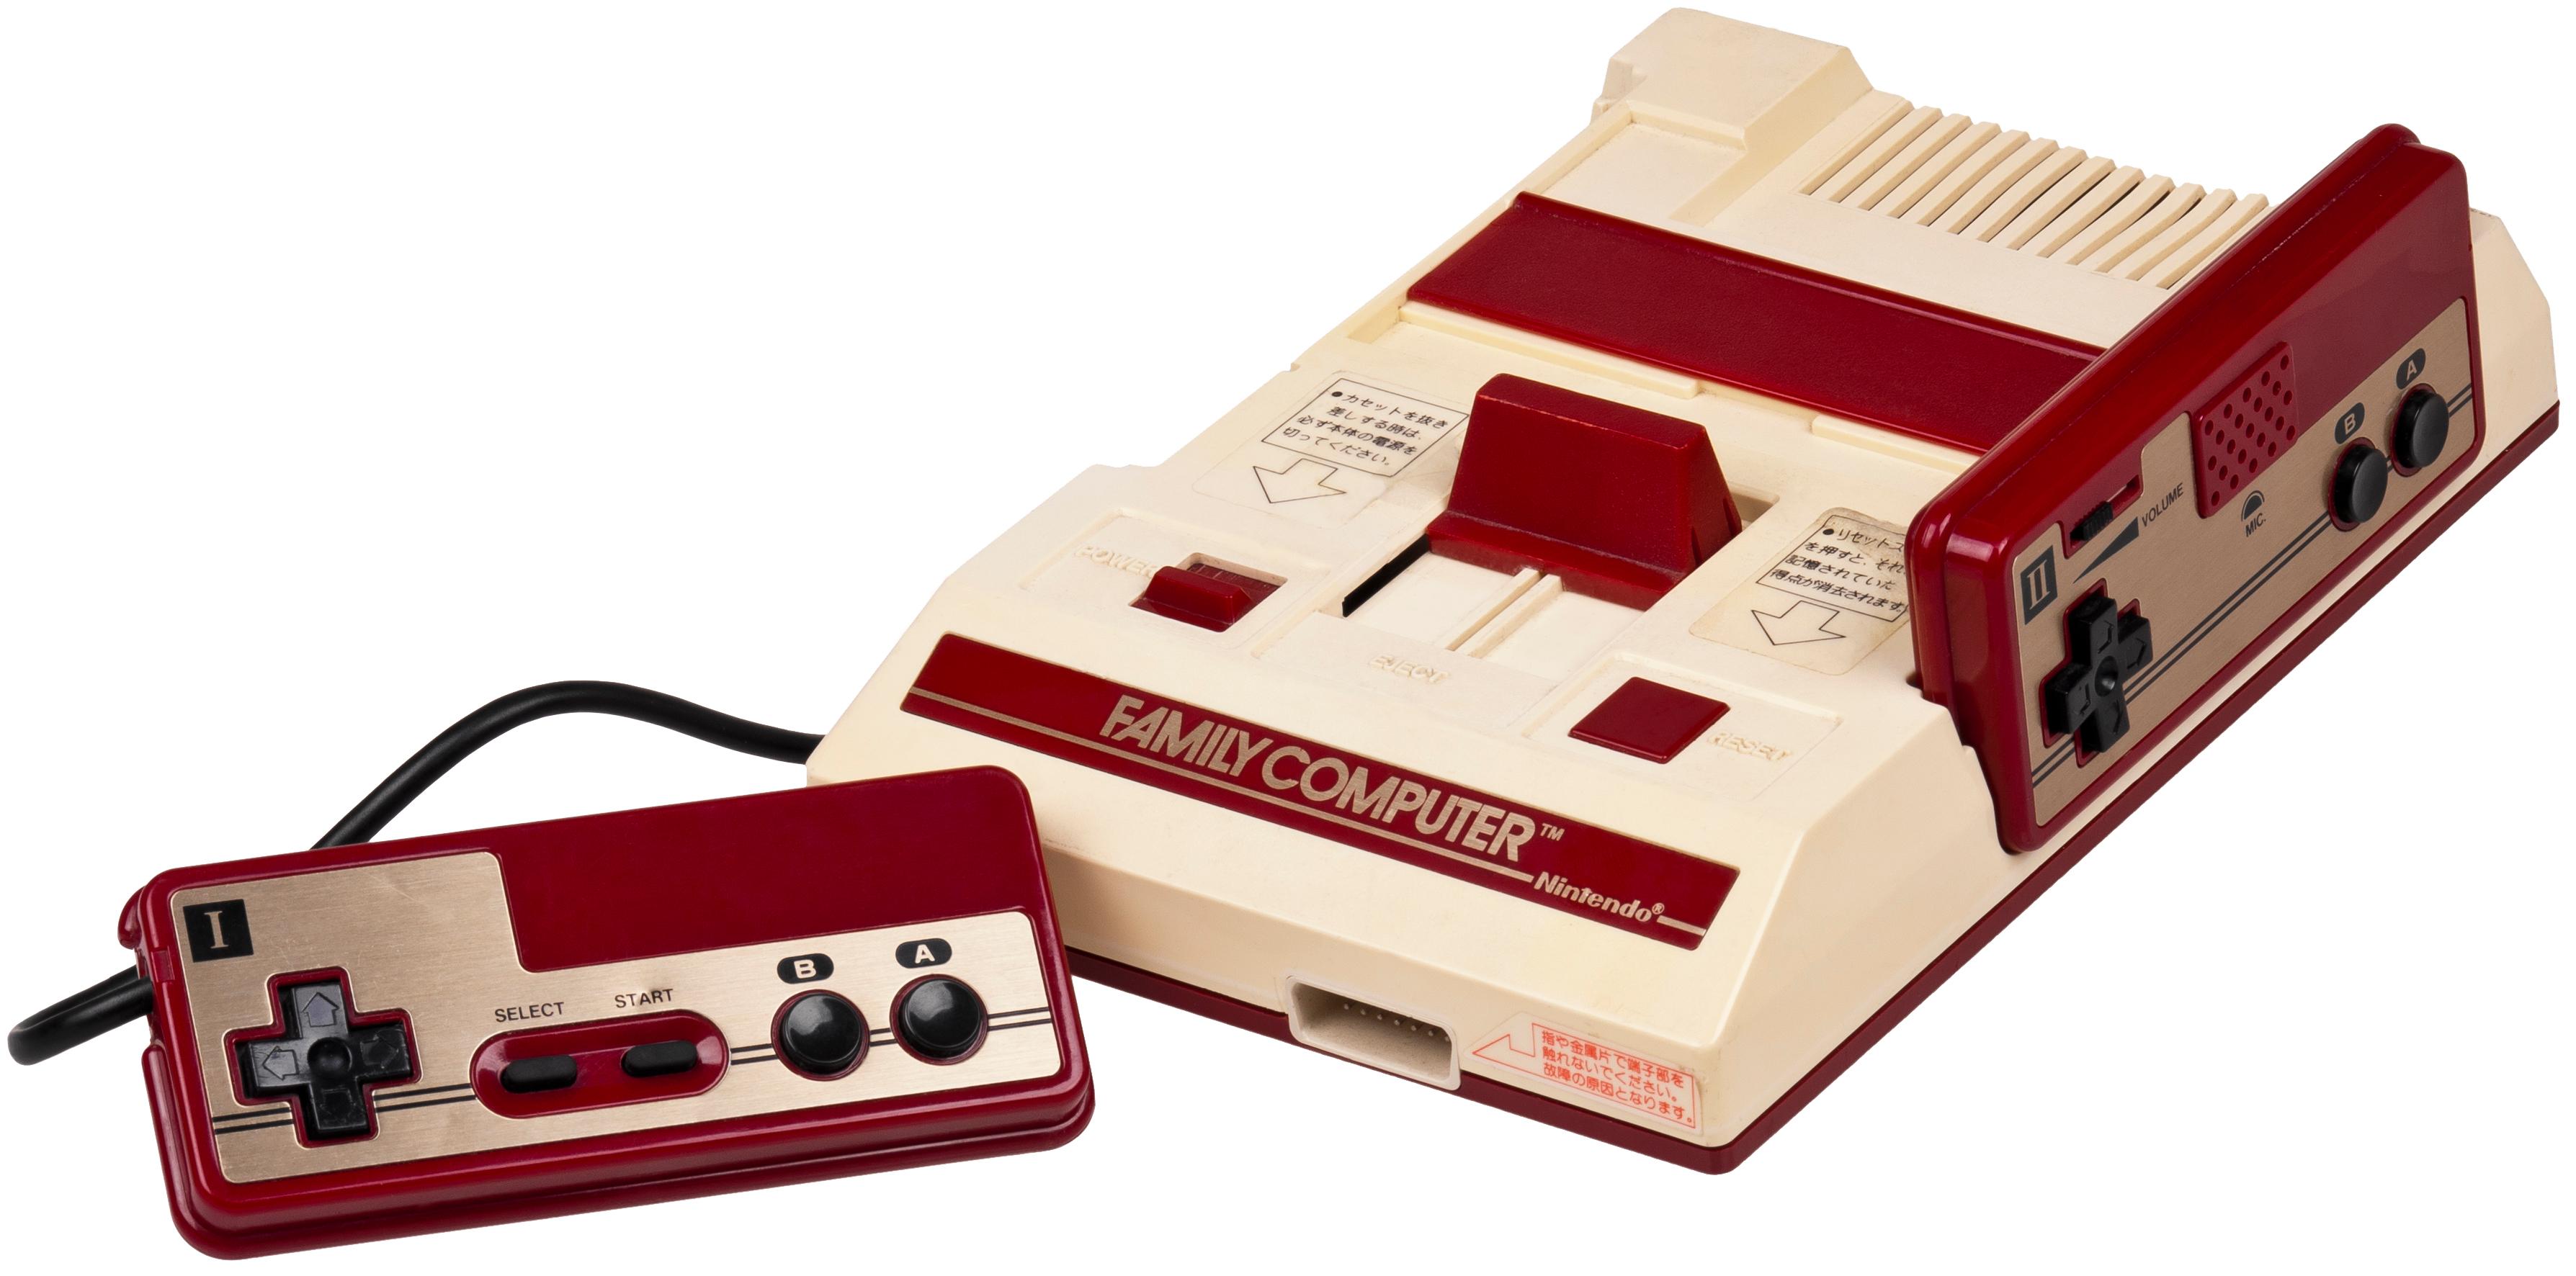 Nintendo entertainment system dolphin emulator wiki famicom consoleg publicscrutiny Gallery